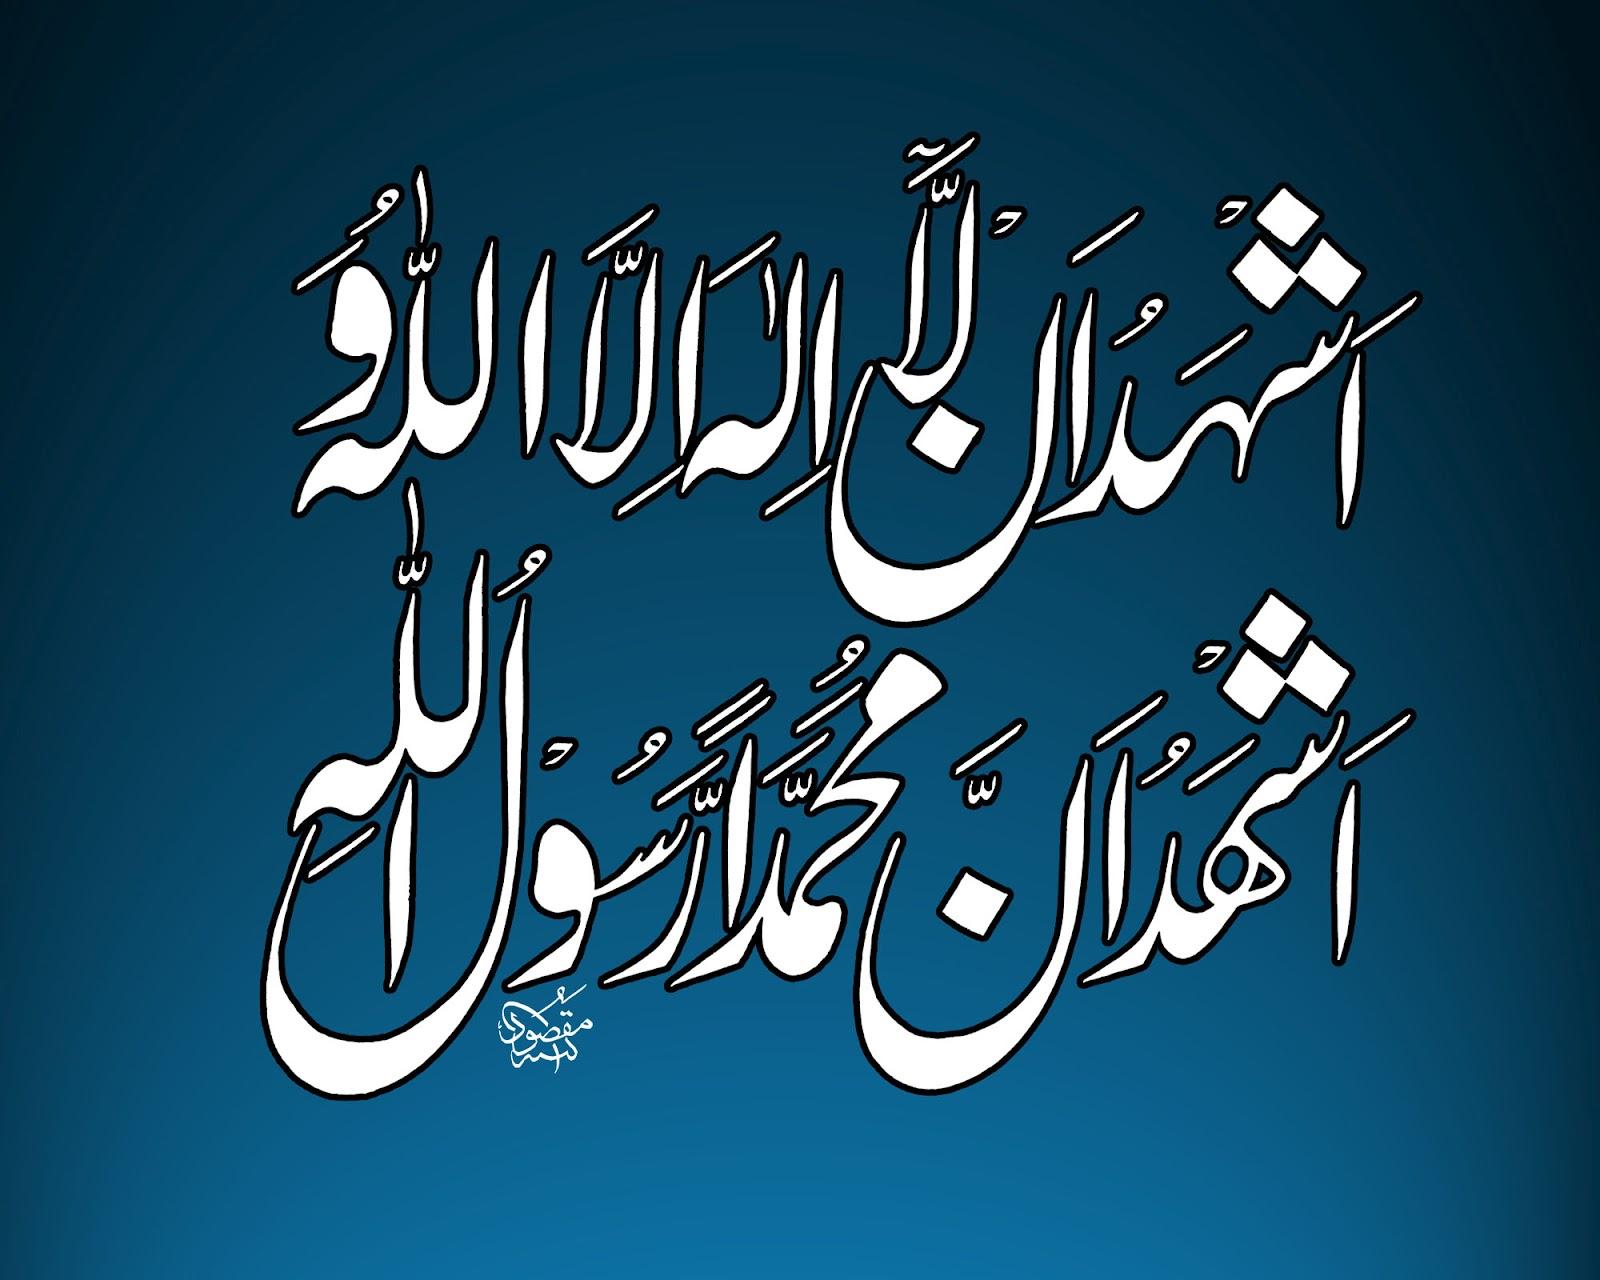 File:Islamic Calligraphy Art.jpg - Wikimedia Commons